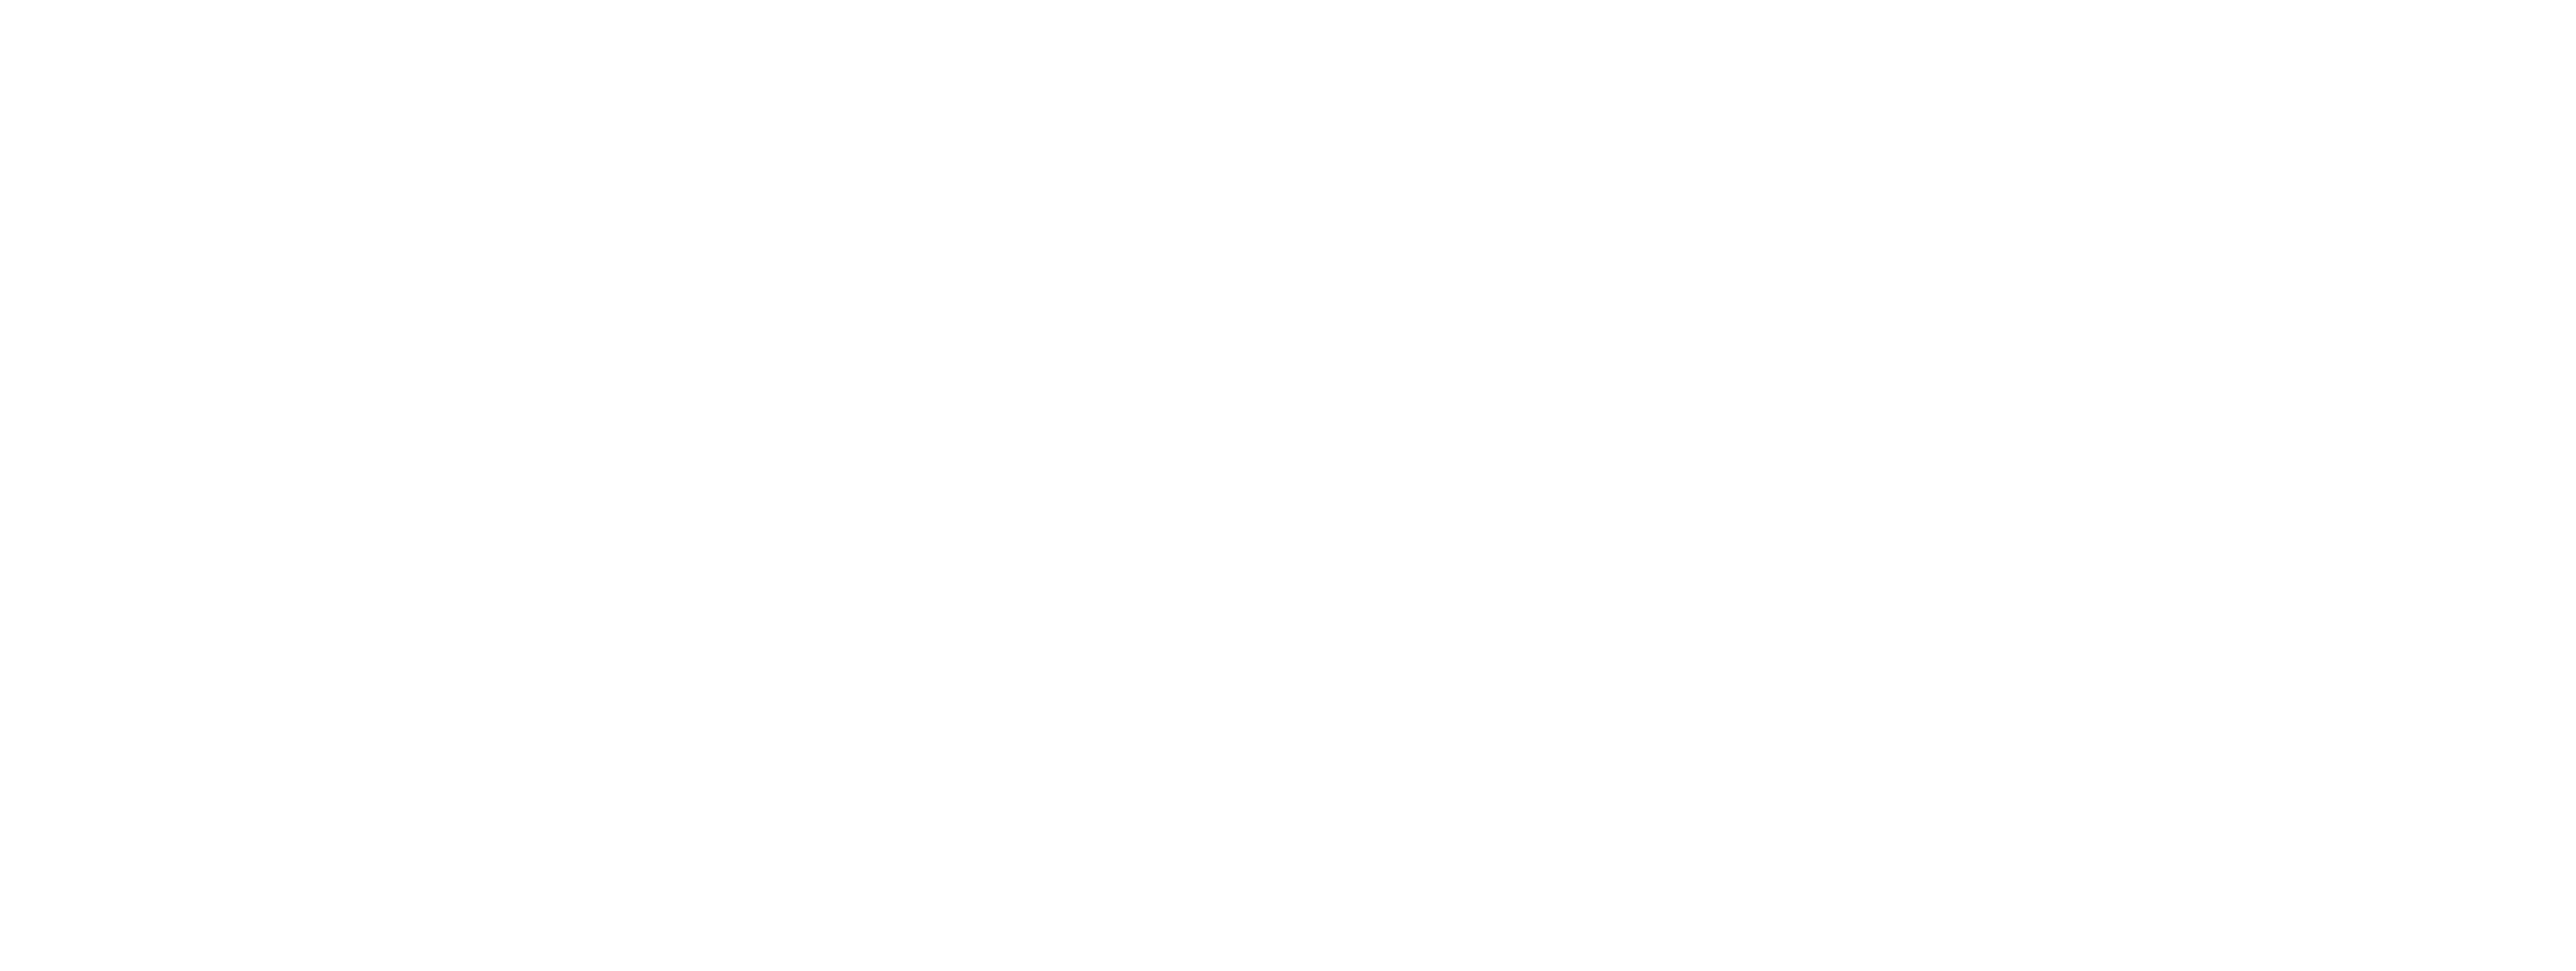 ealloora.com